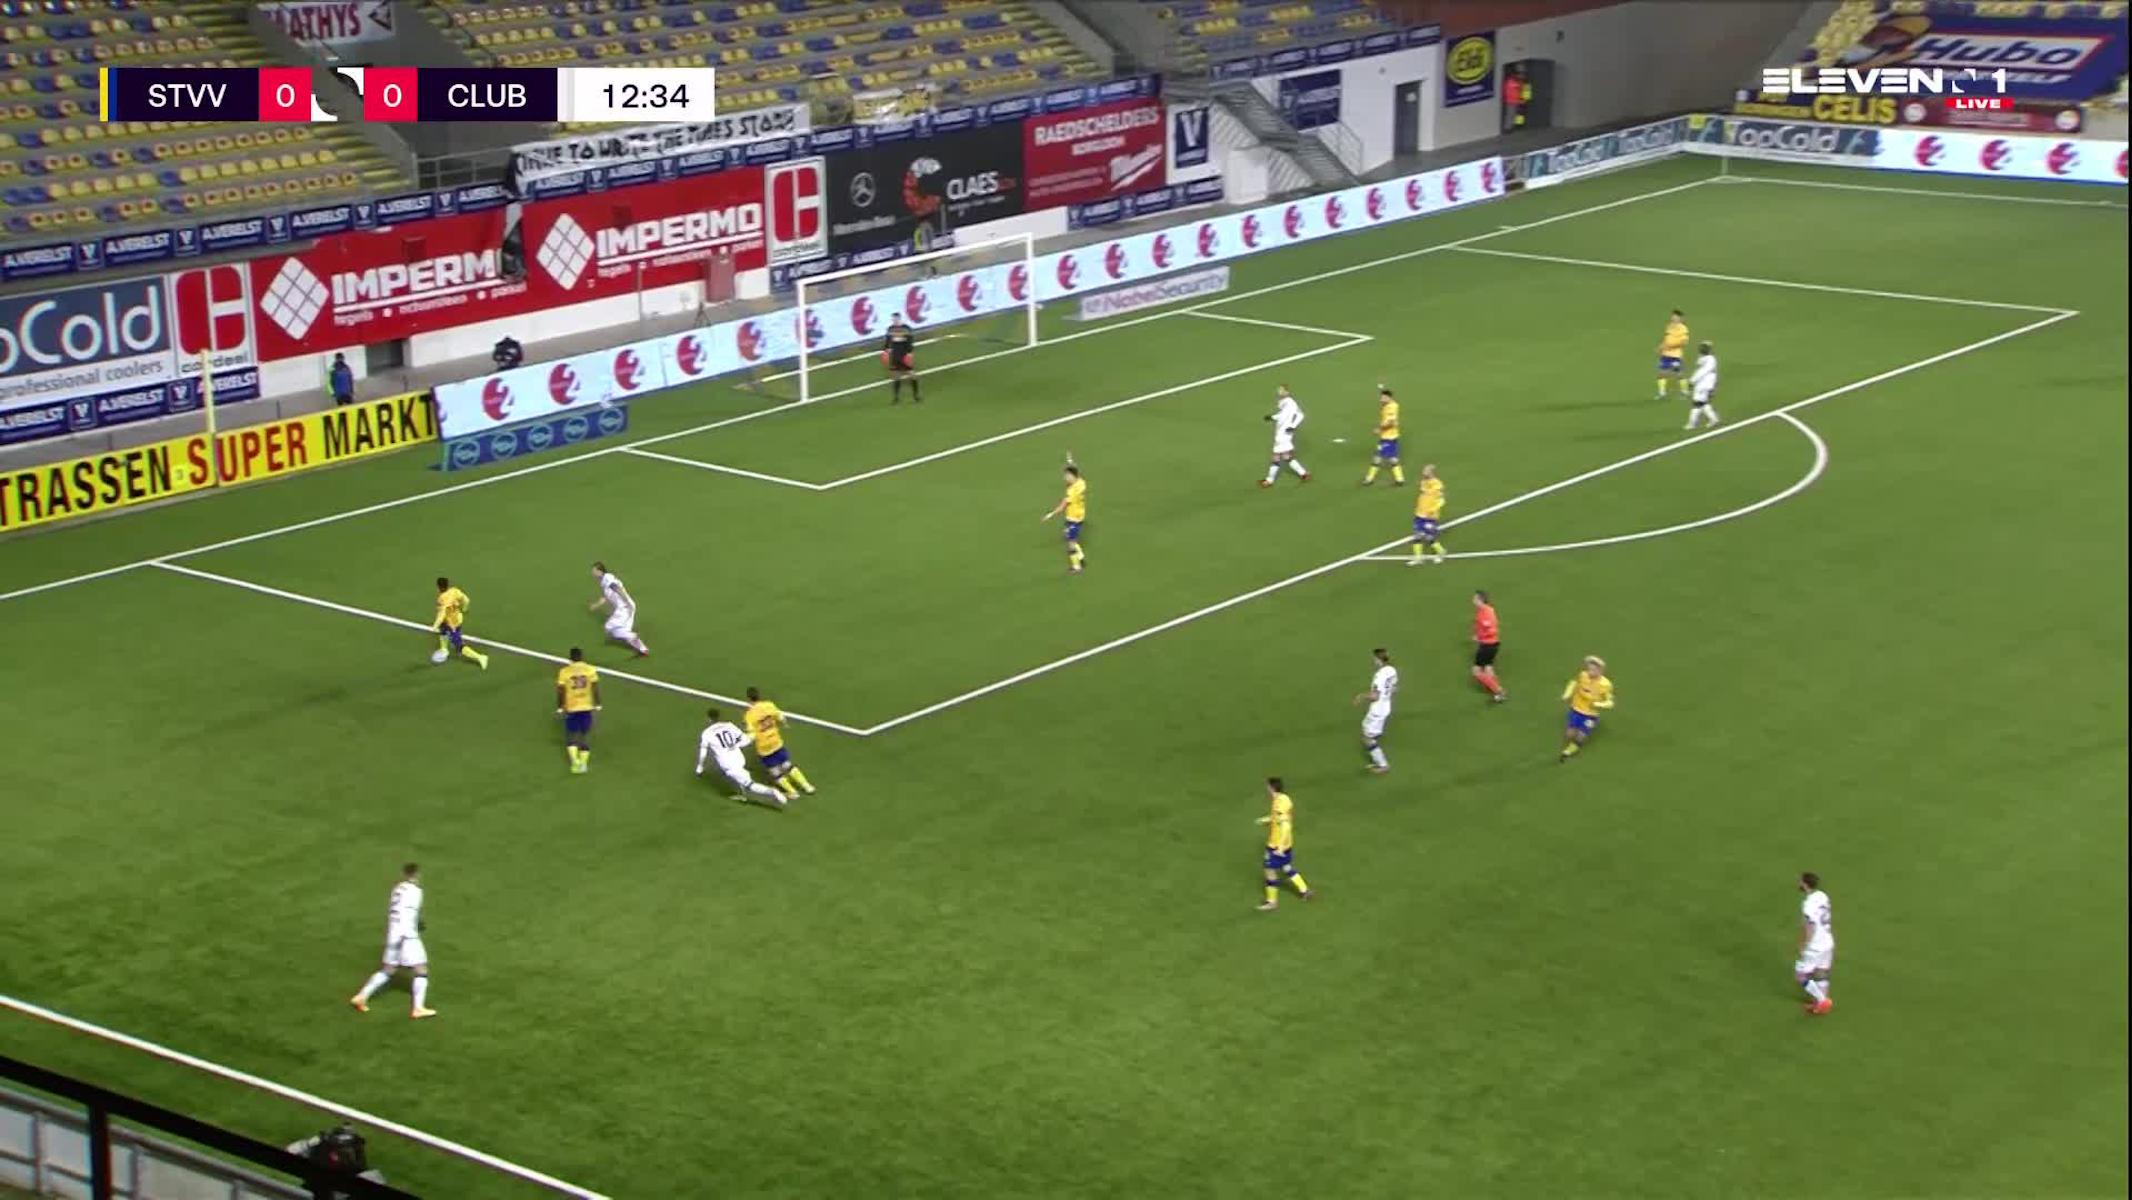 Doelpunt Bas Dost (STVV vs. Club Brugge)